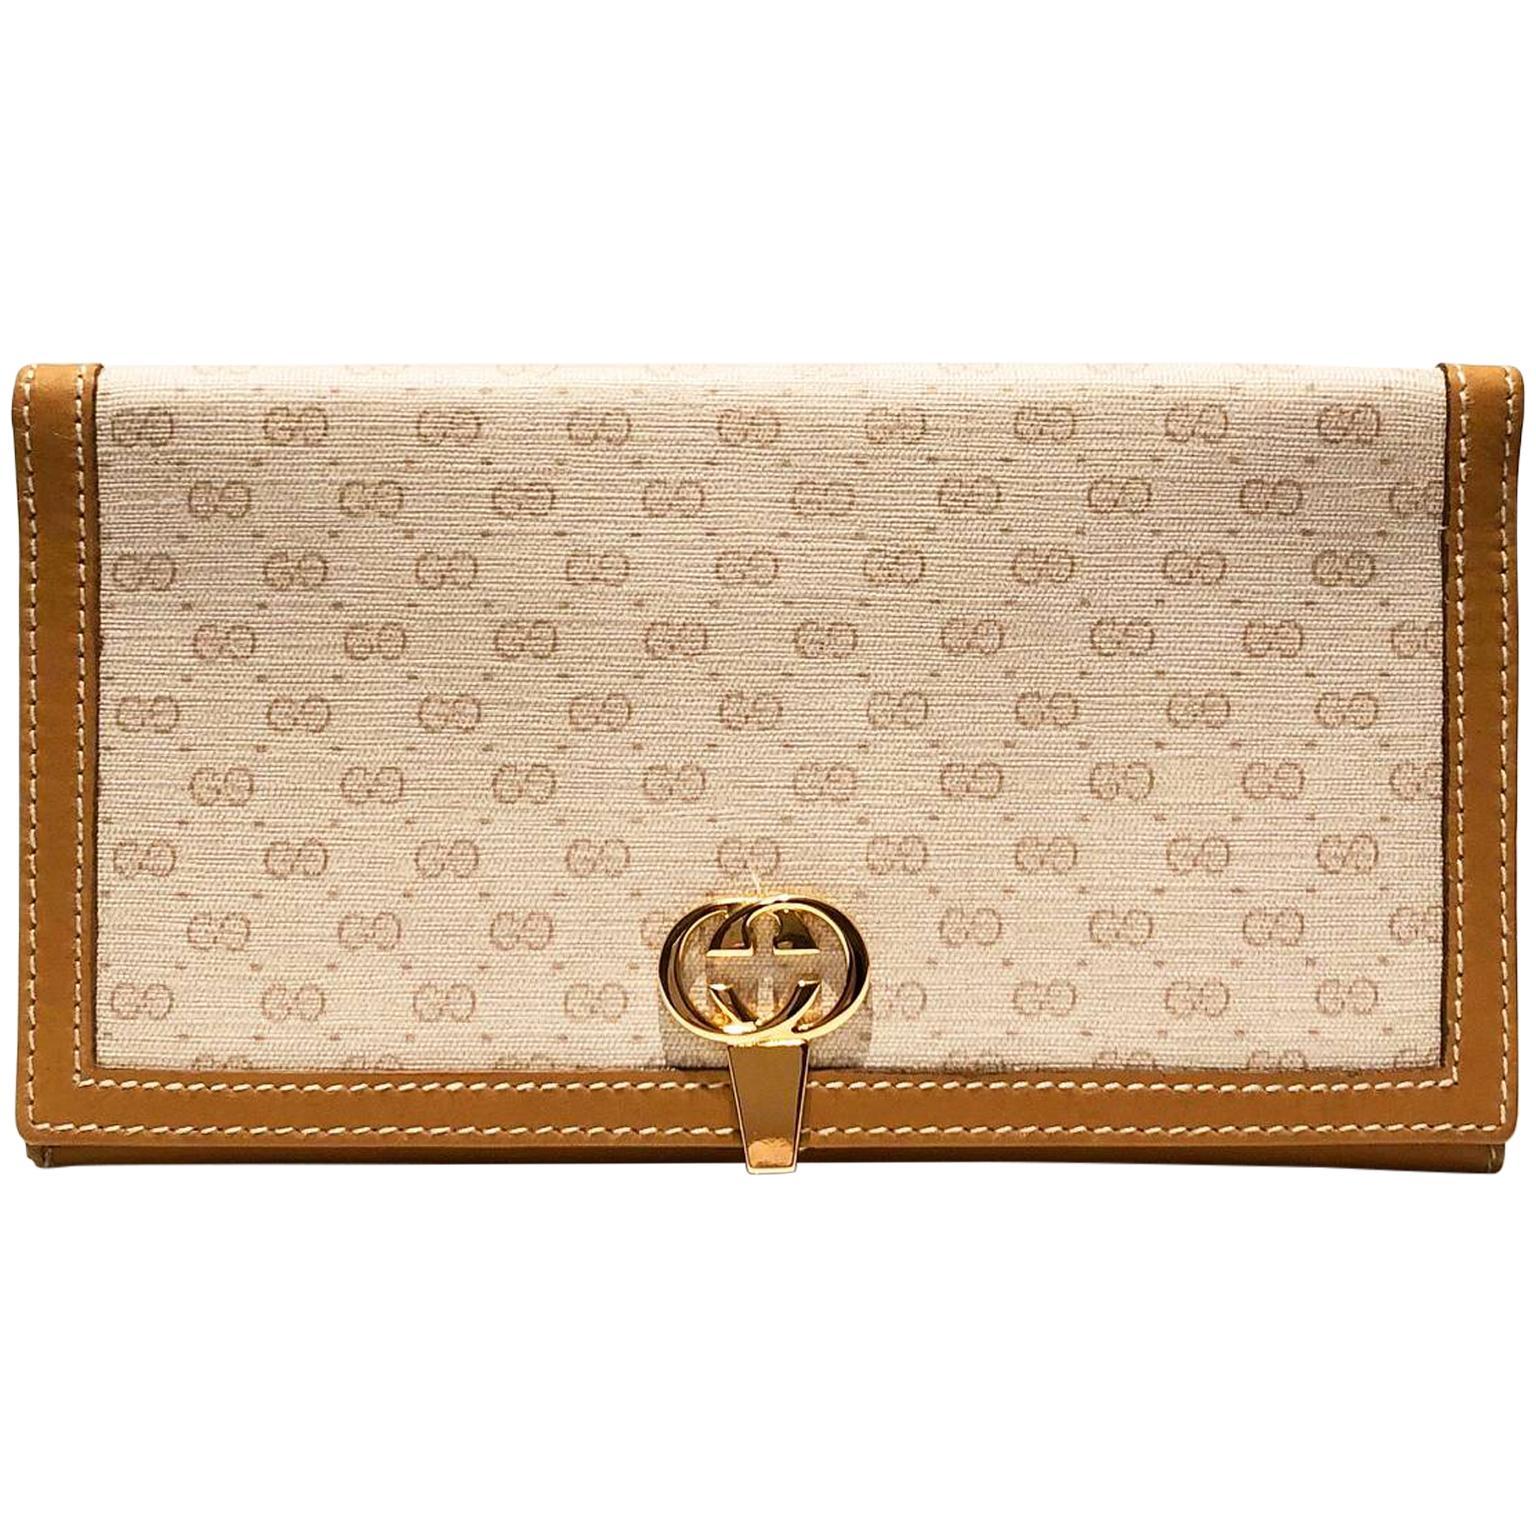 1980s Gucci Interlocking Logo Clutch Tan Leather Monogram Wallet